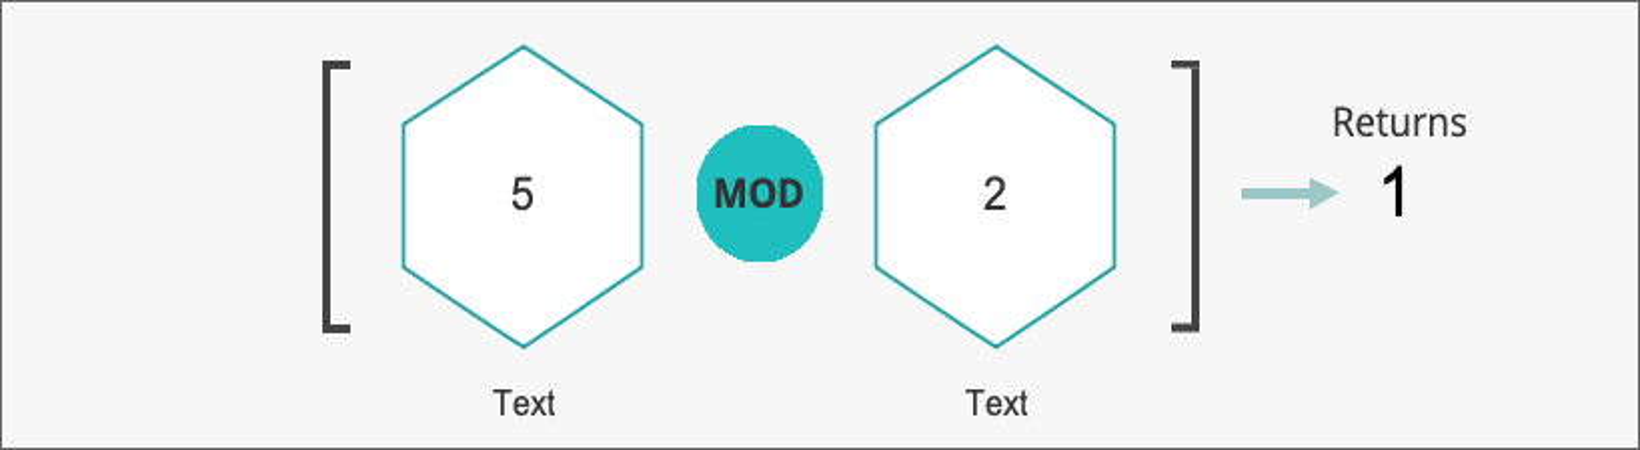 Mod Example